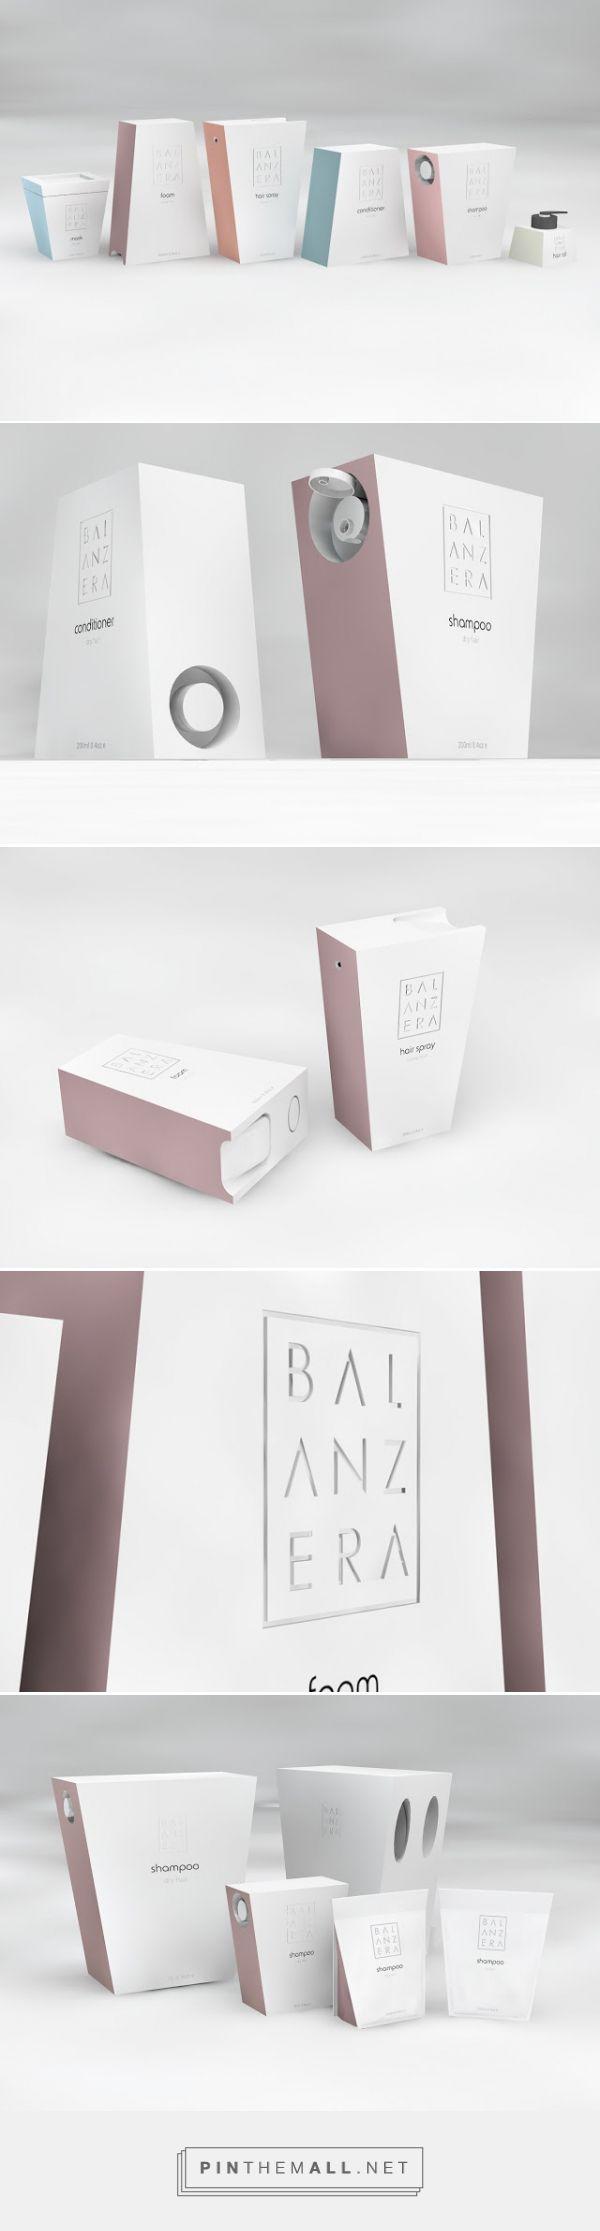 Balanzera #Cosmetic #concept #packaging by Elena Antoniou - http://www.packagingoftheworld.com/2015/01/balanzera-cosmetic-products-concept.html